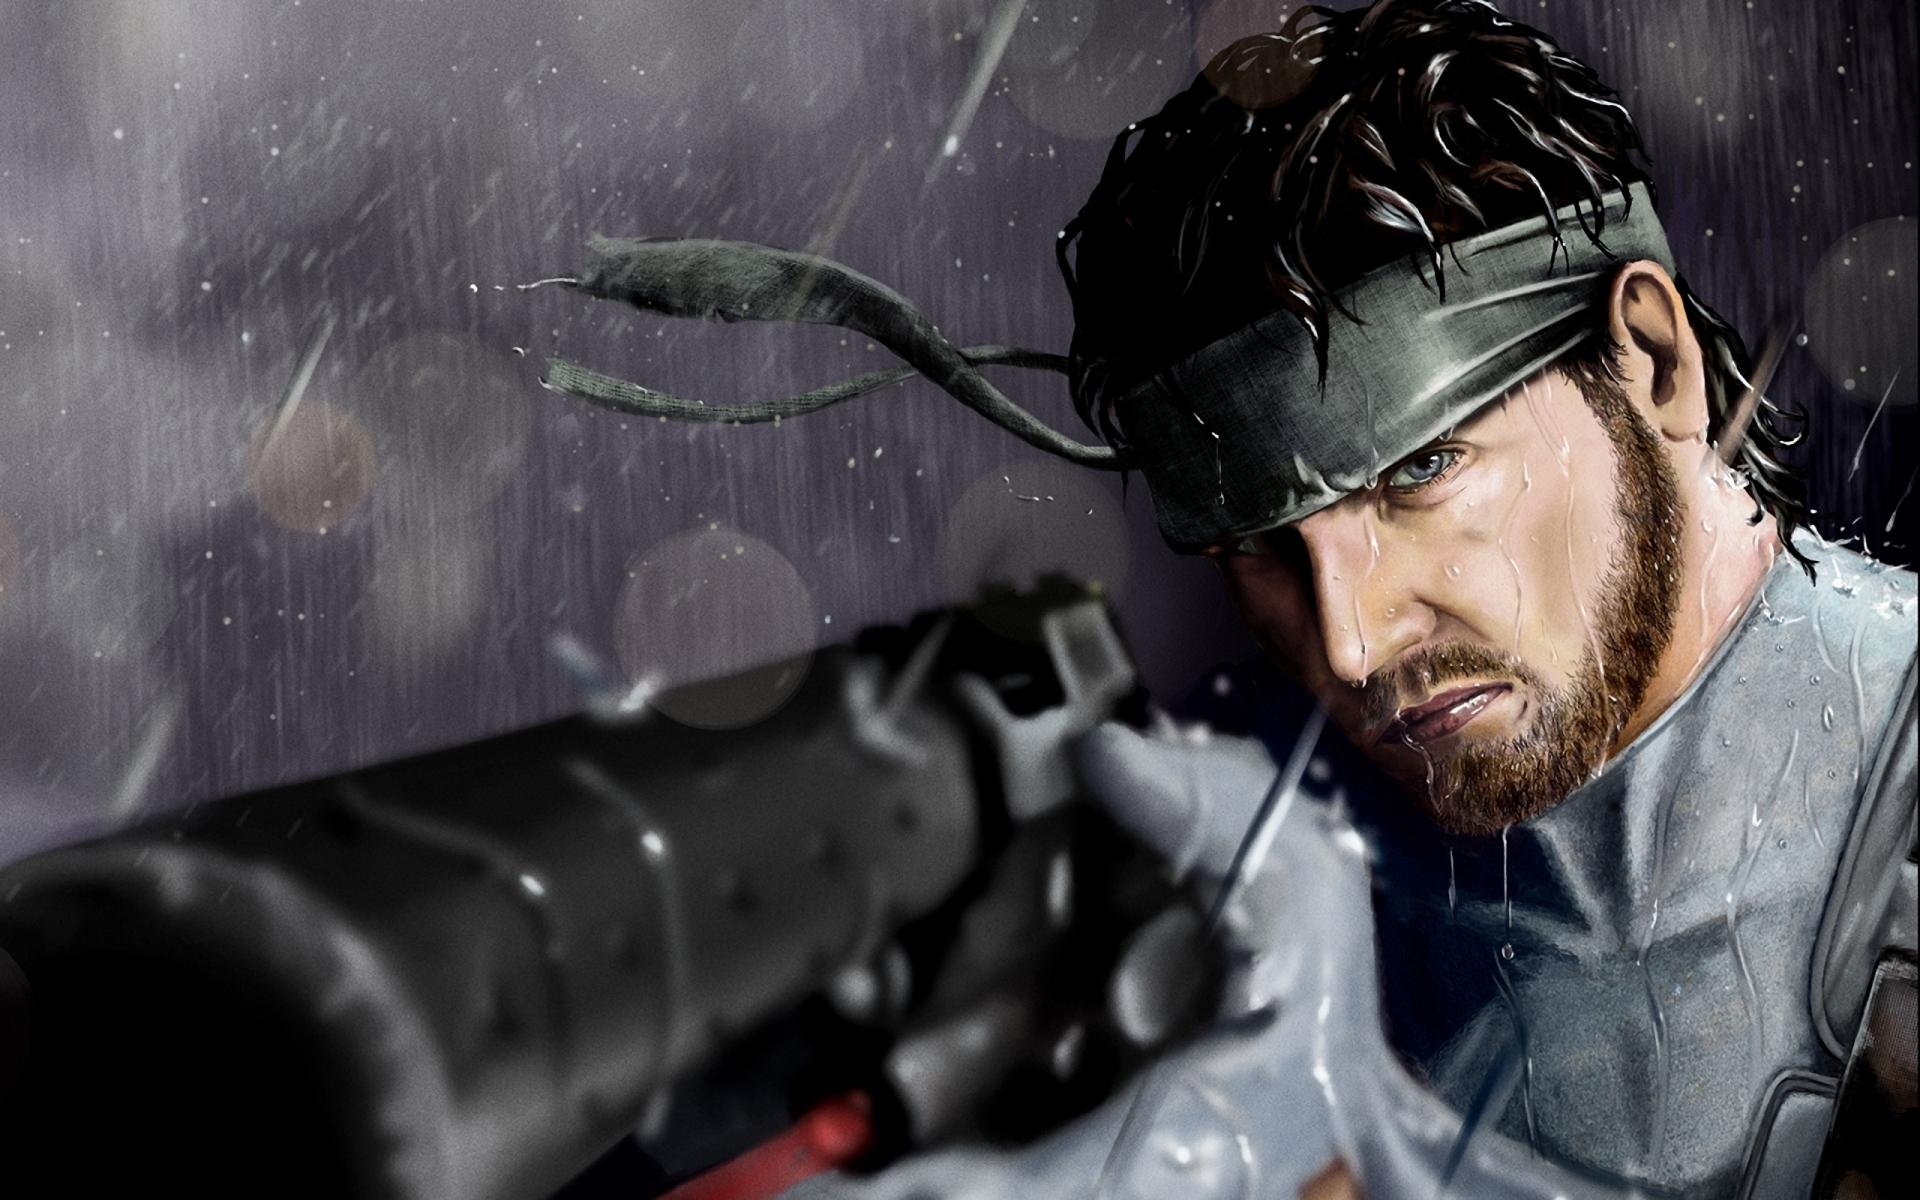 Metal Gear Solid 5 31143 1920x1200px